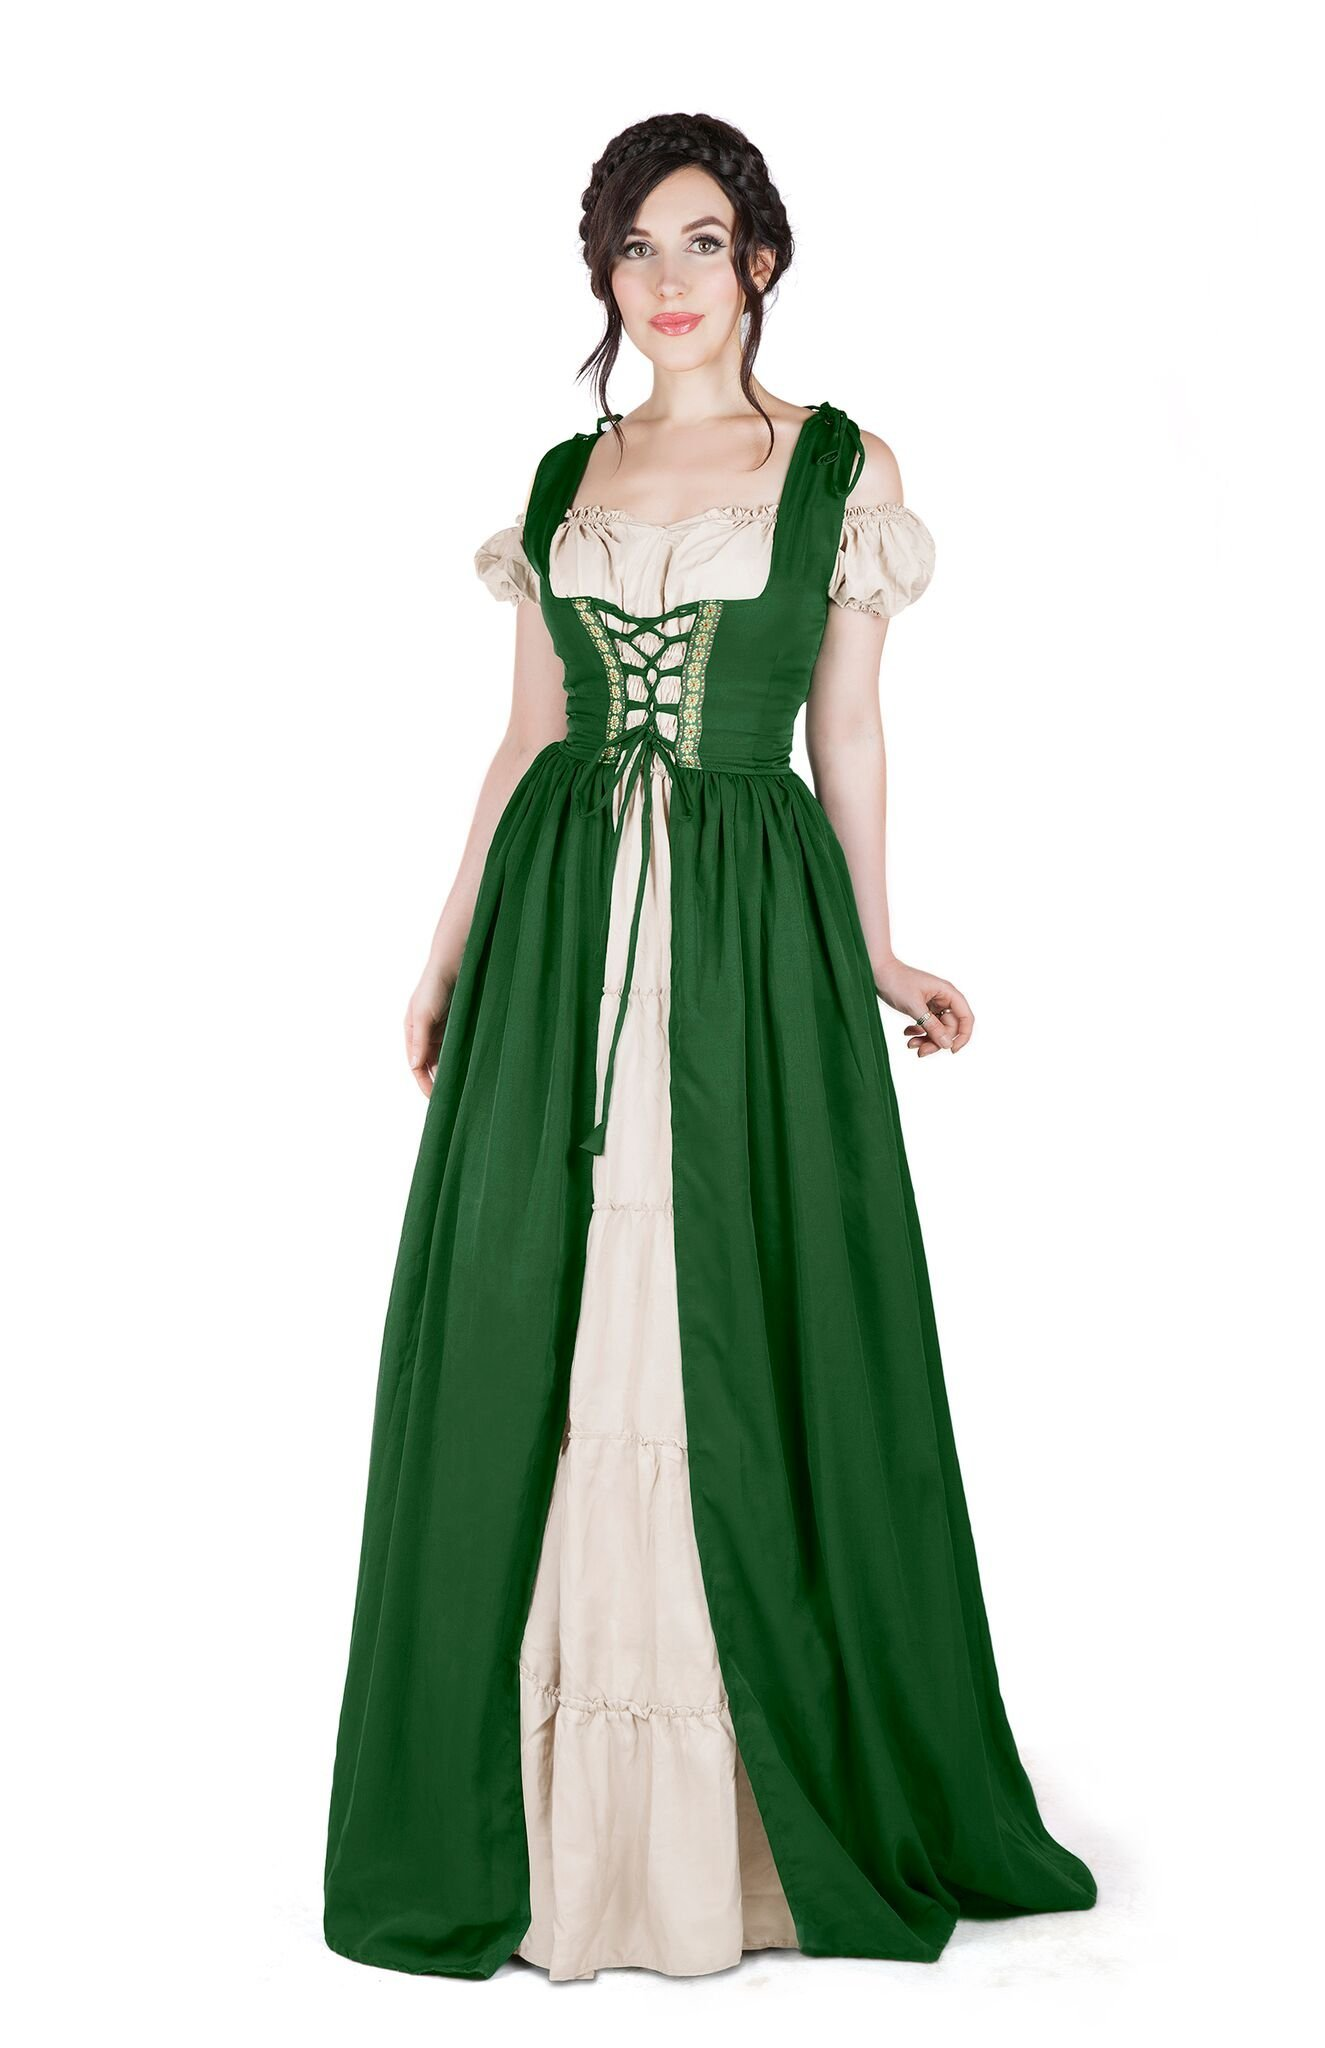 I Do Declare Renaissance Medieval Irish Costume Over Dress & Boho Chemise Set (L/XL, Hunter Green)